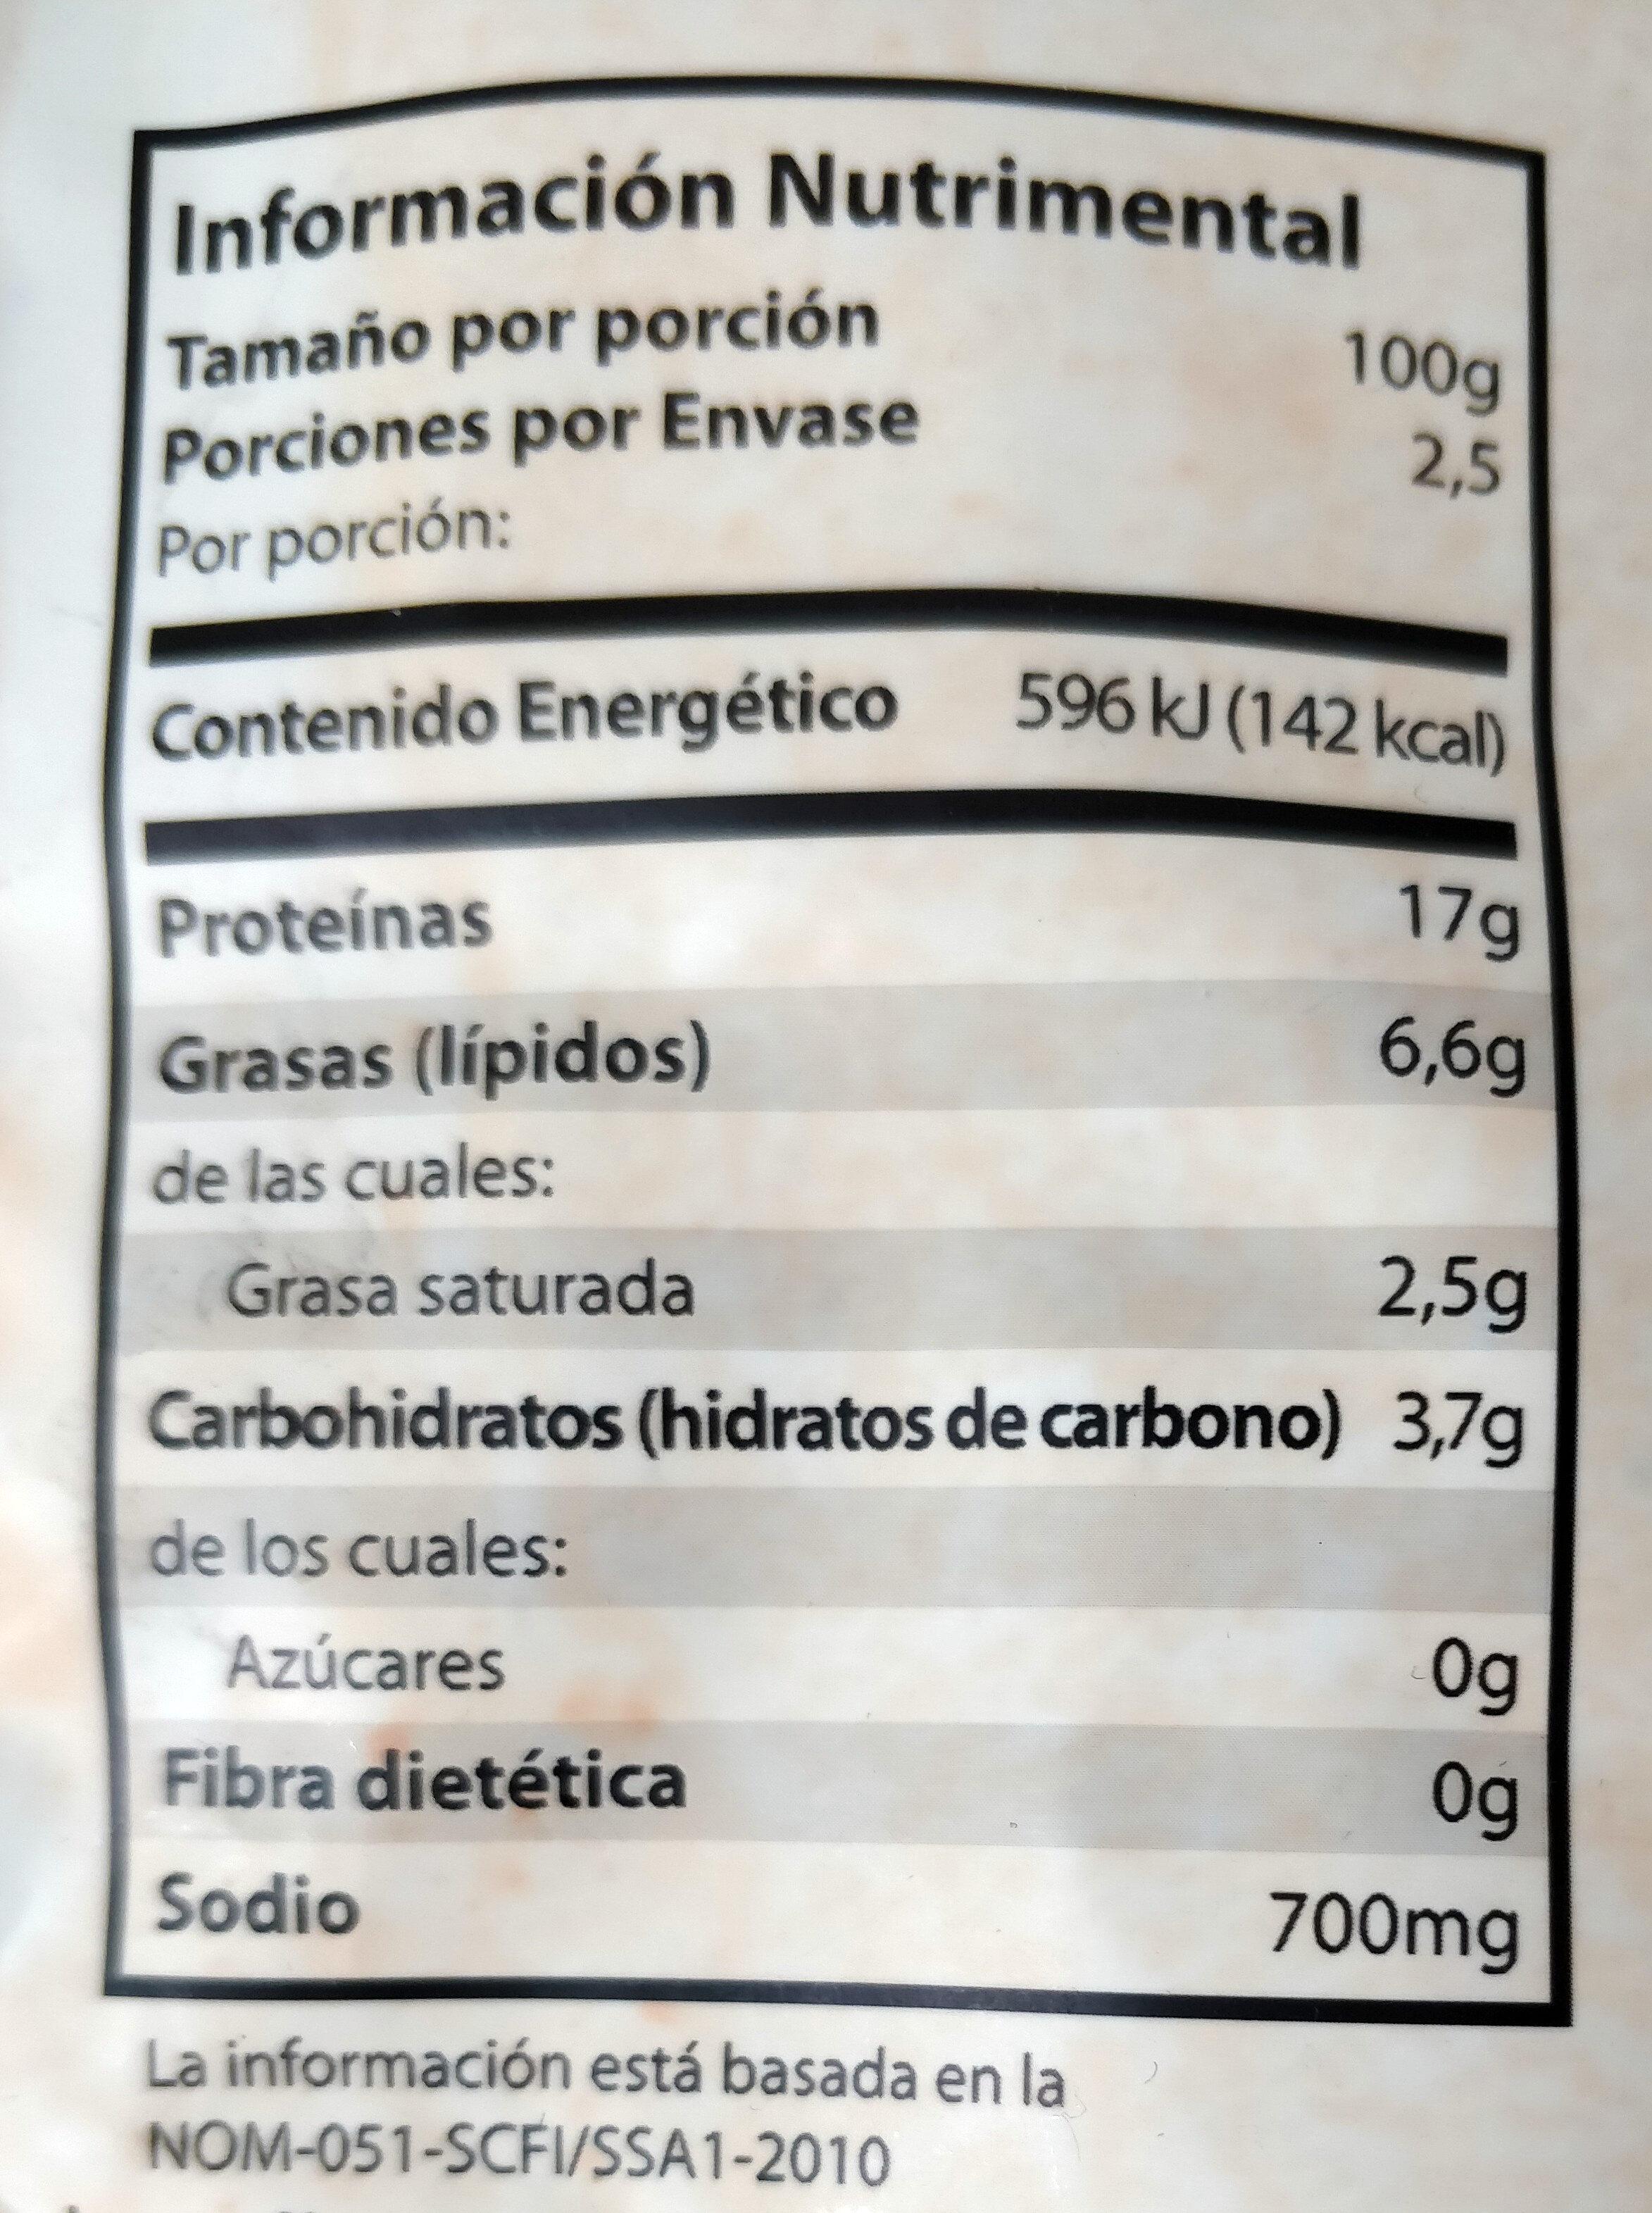 Chata, cochinita pibil shredded pork meat - Nutrition facts - en